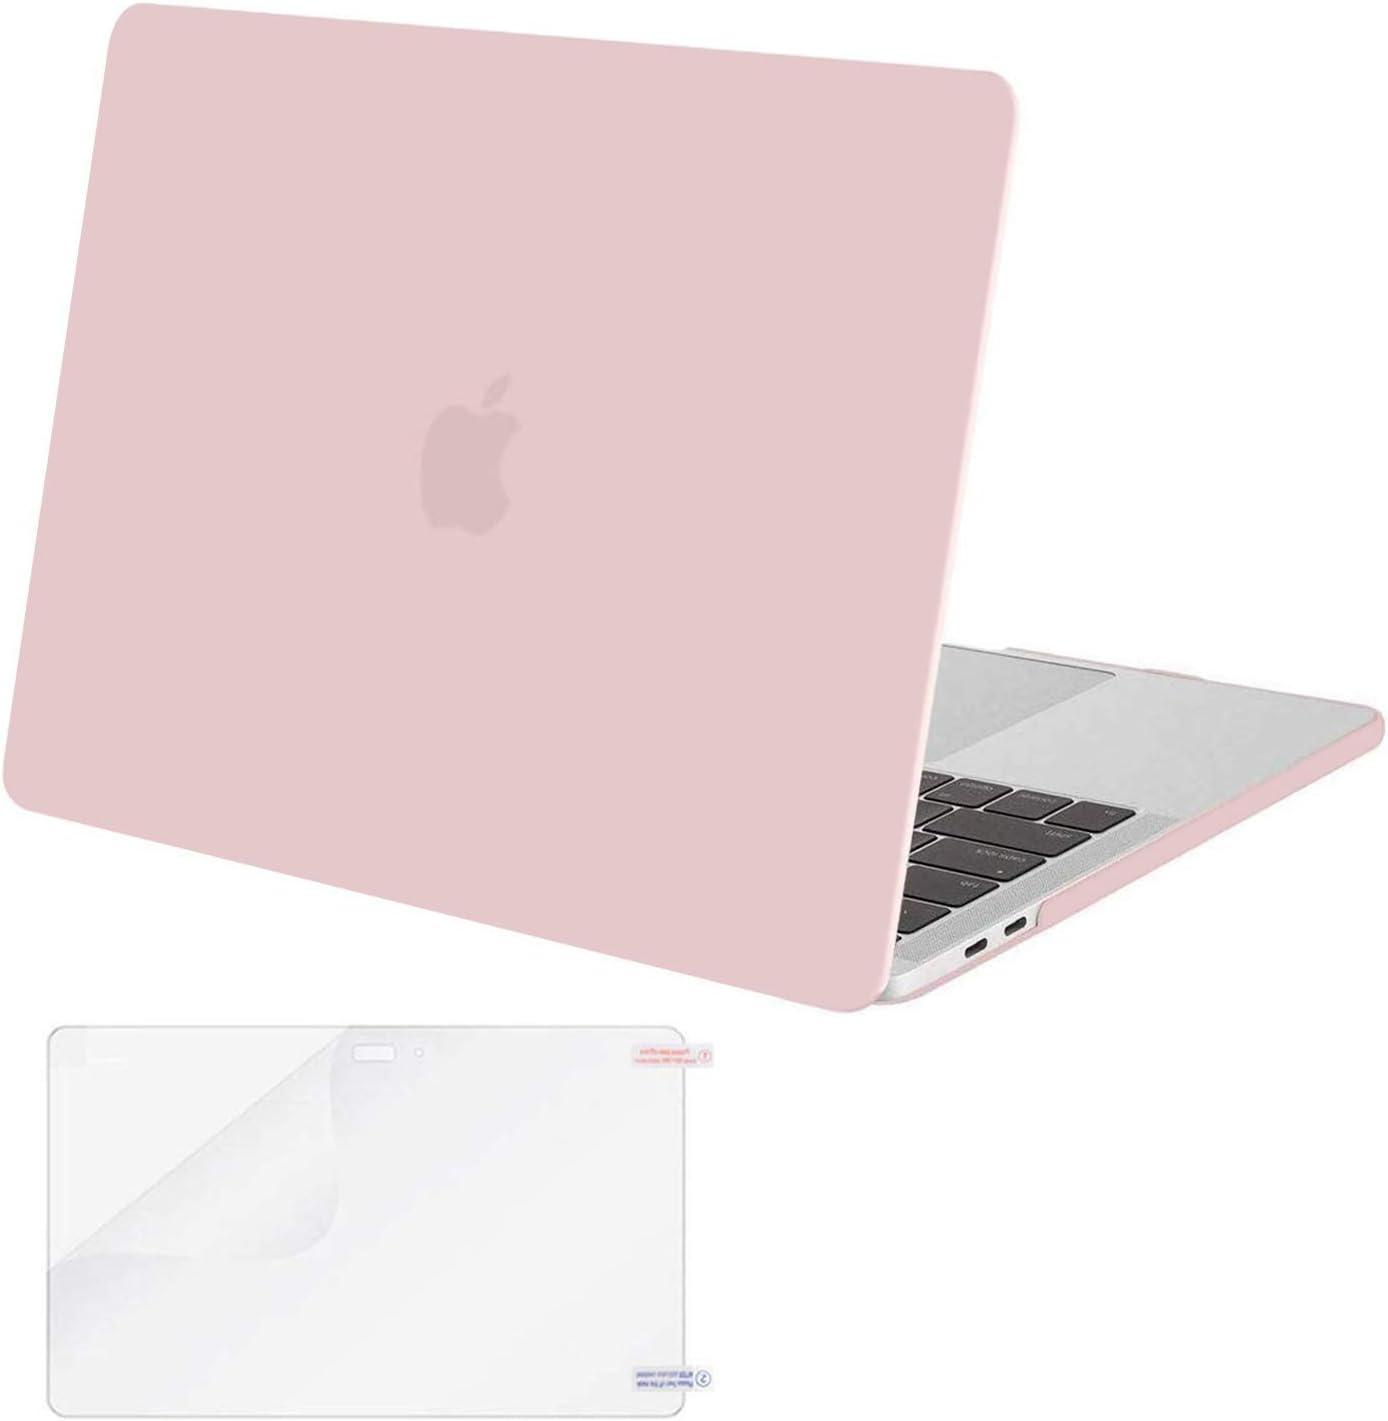 MOSISO MacBook Pro 15 inch Case 2019 2018 2017 2016 Release A1990 A1707, Plastic Hard Shell Cover & Screen Protector Compatible with MacBook Pro 15 inch with Touch Bar and Touch ID, Rose Quartz